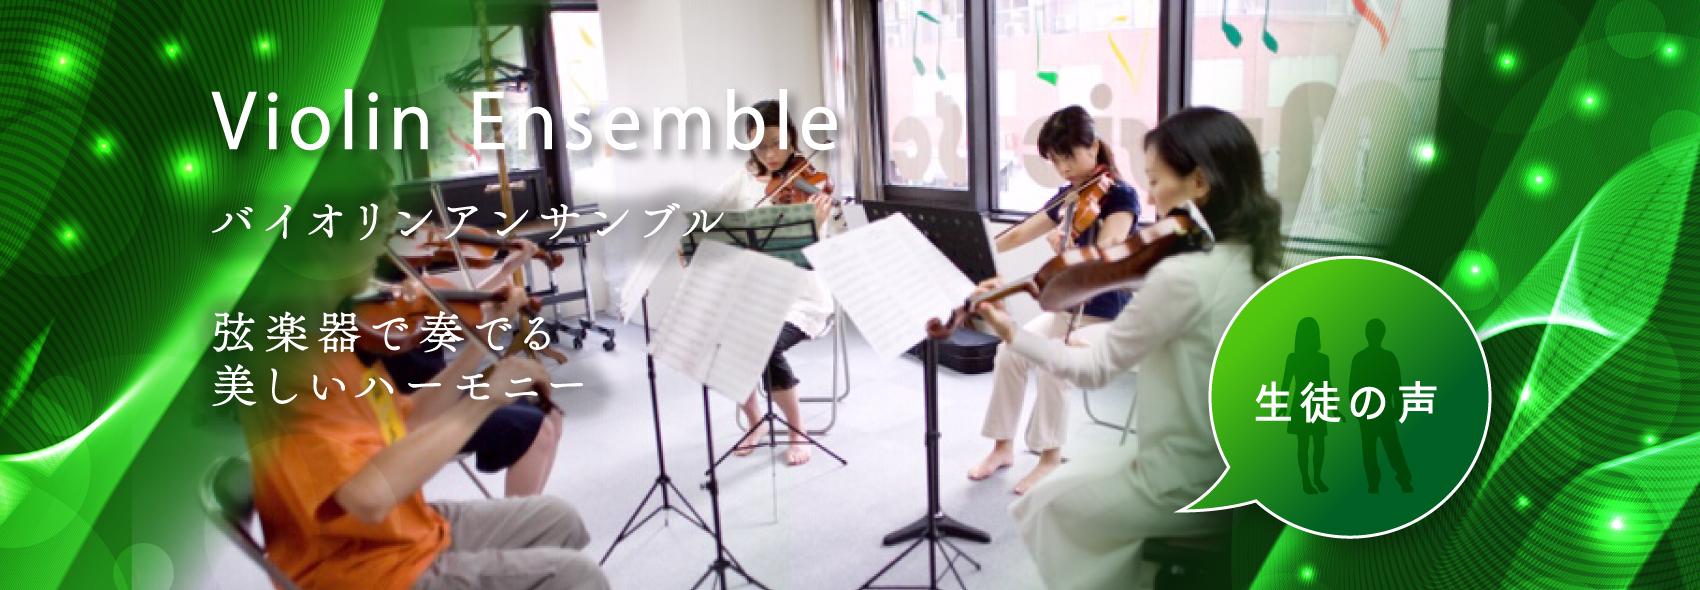 Violin Ensemble 弦楽器で奏でる 美しいハーモニー